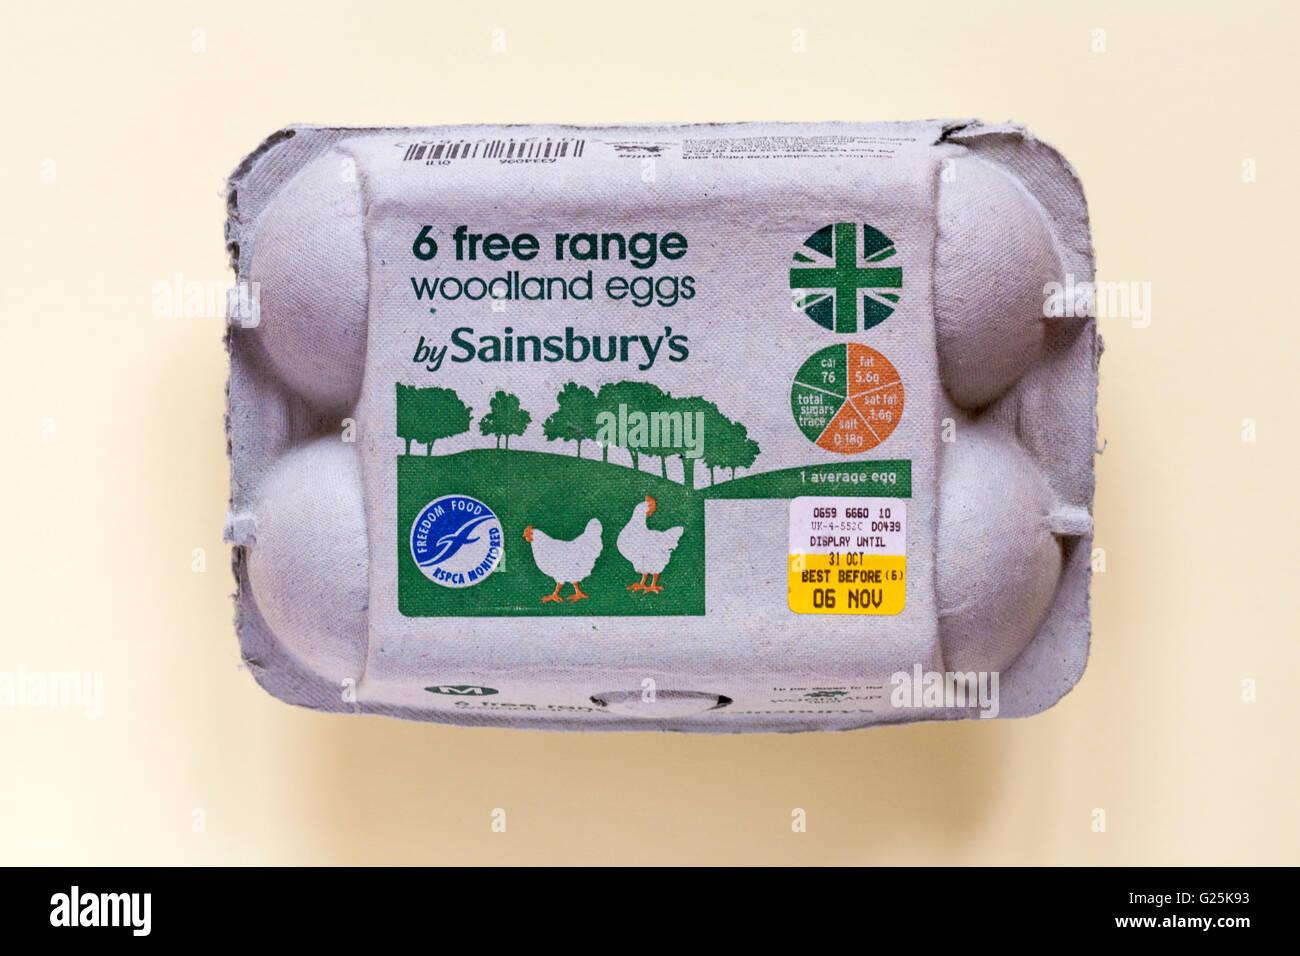 Carton of 6 free range woodland eggs by Sainsburys isolated on pale yellow background Stock Photo